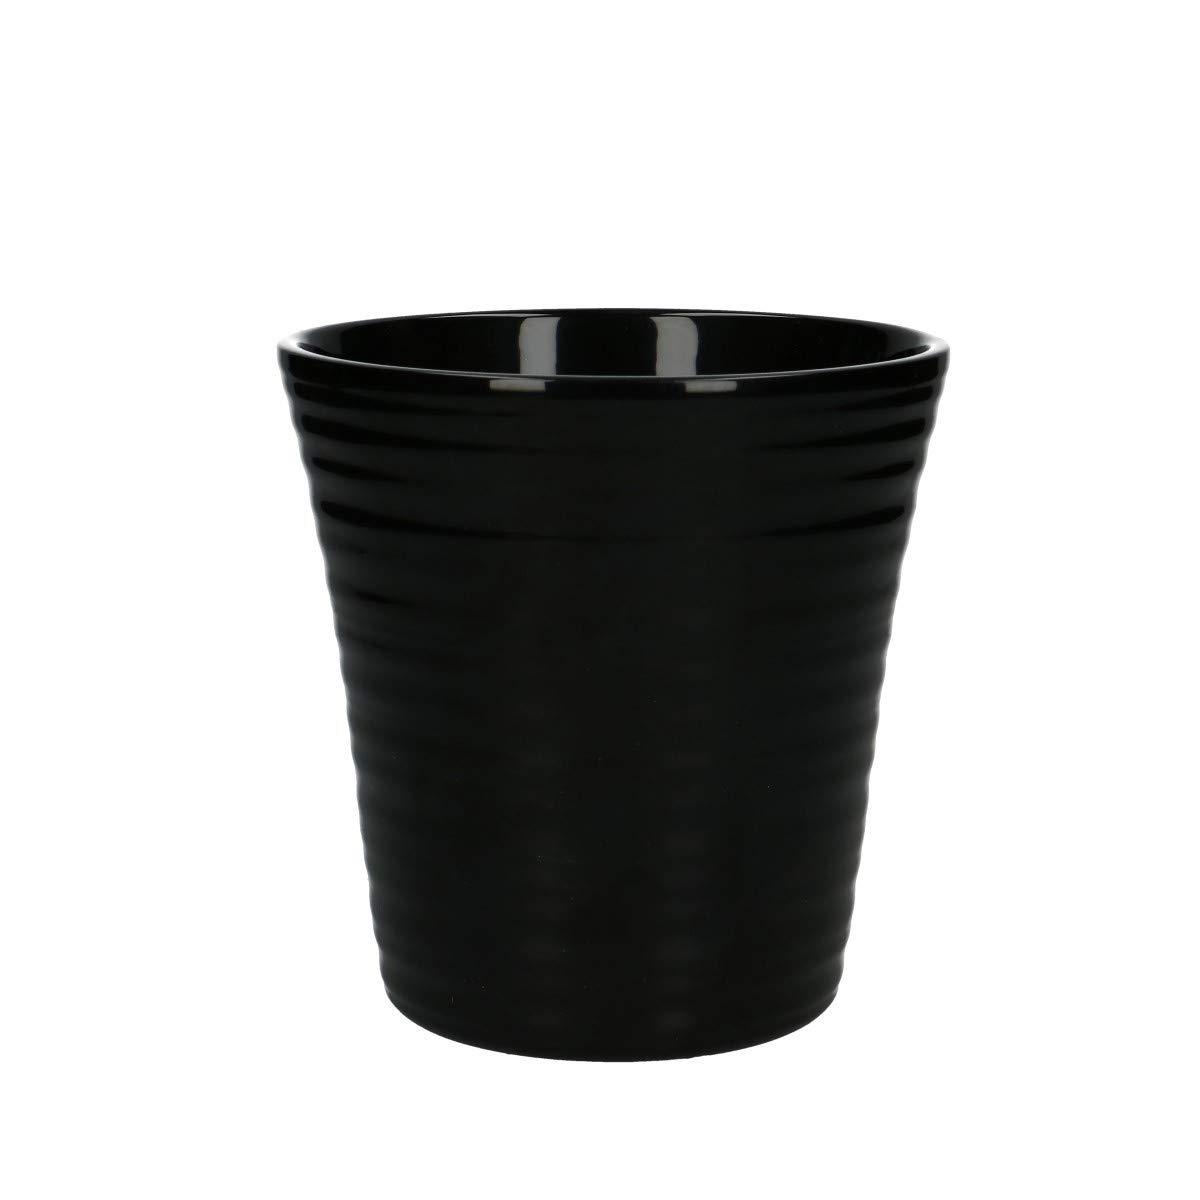 Keramik Orchideentopf mit Rillen T1 Schwarz /Übertopf 12 cm /Ø